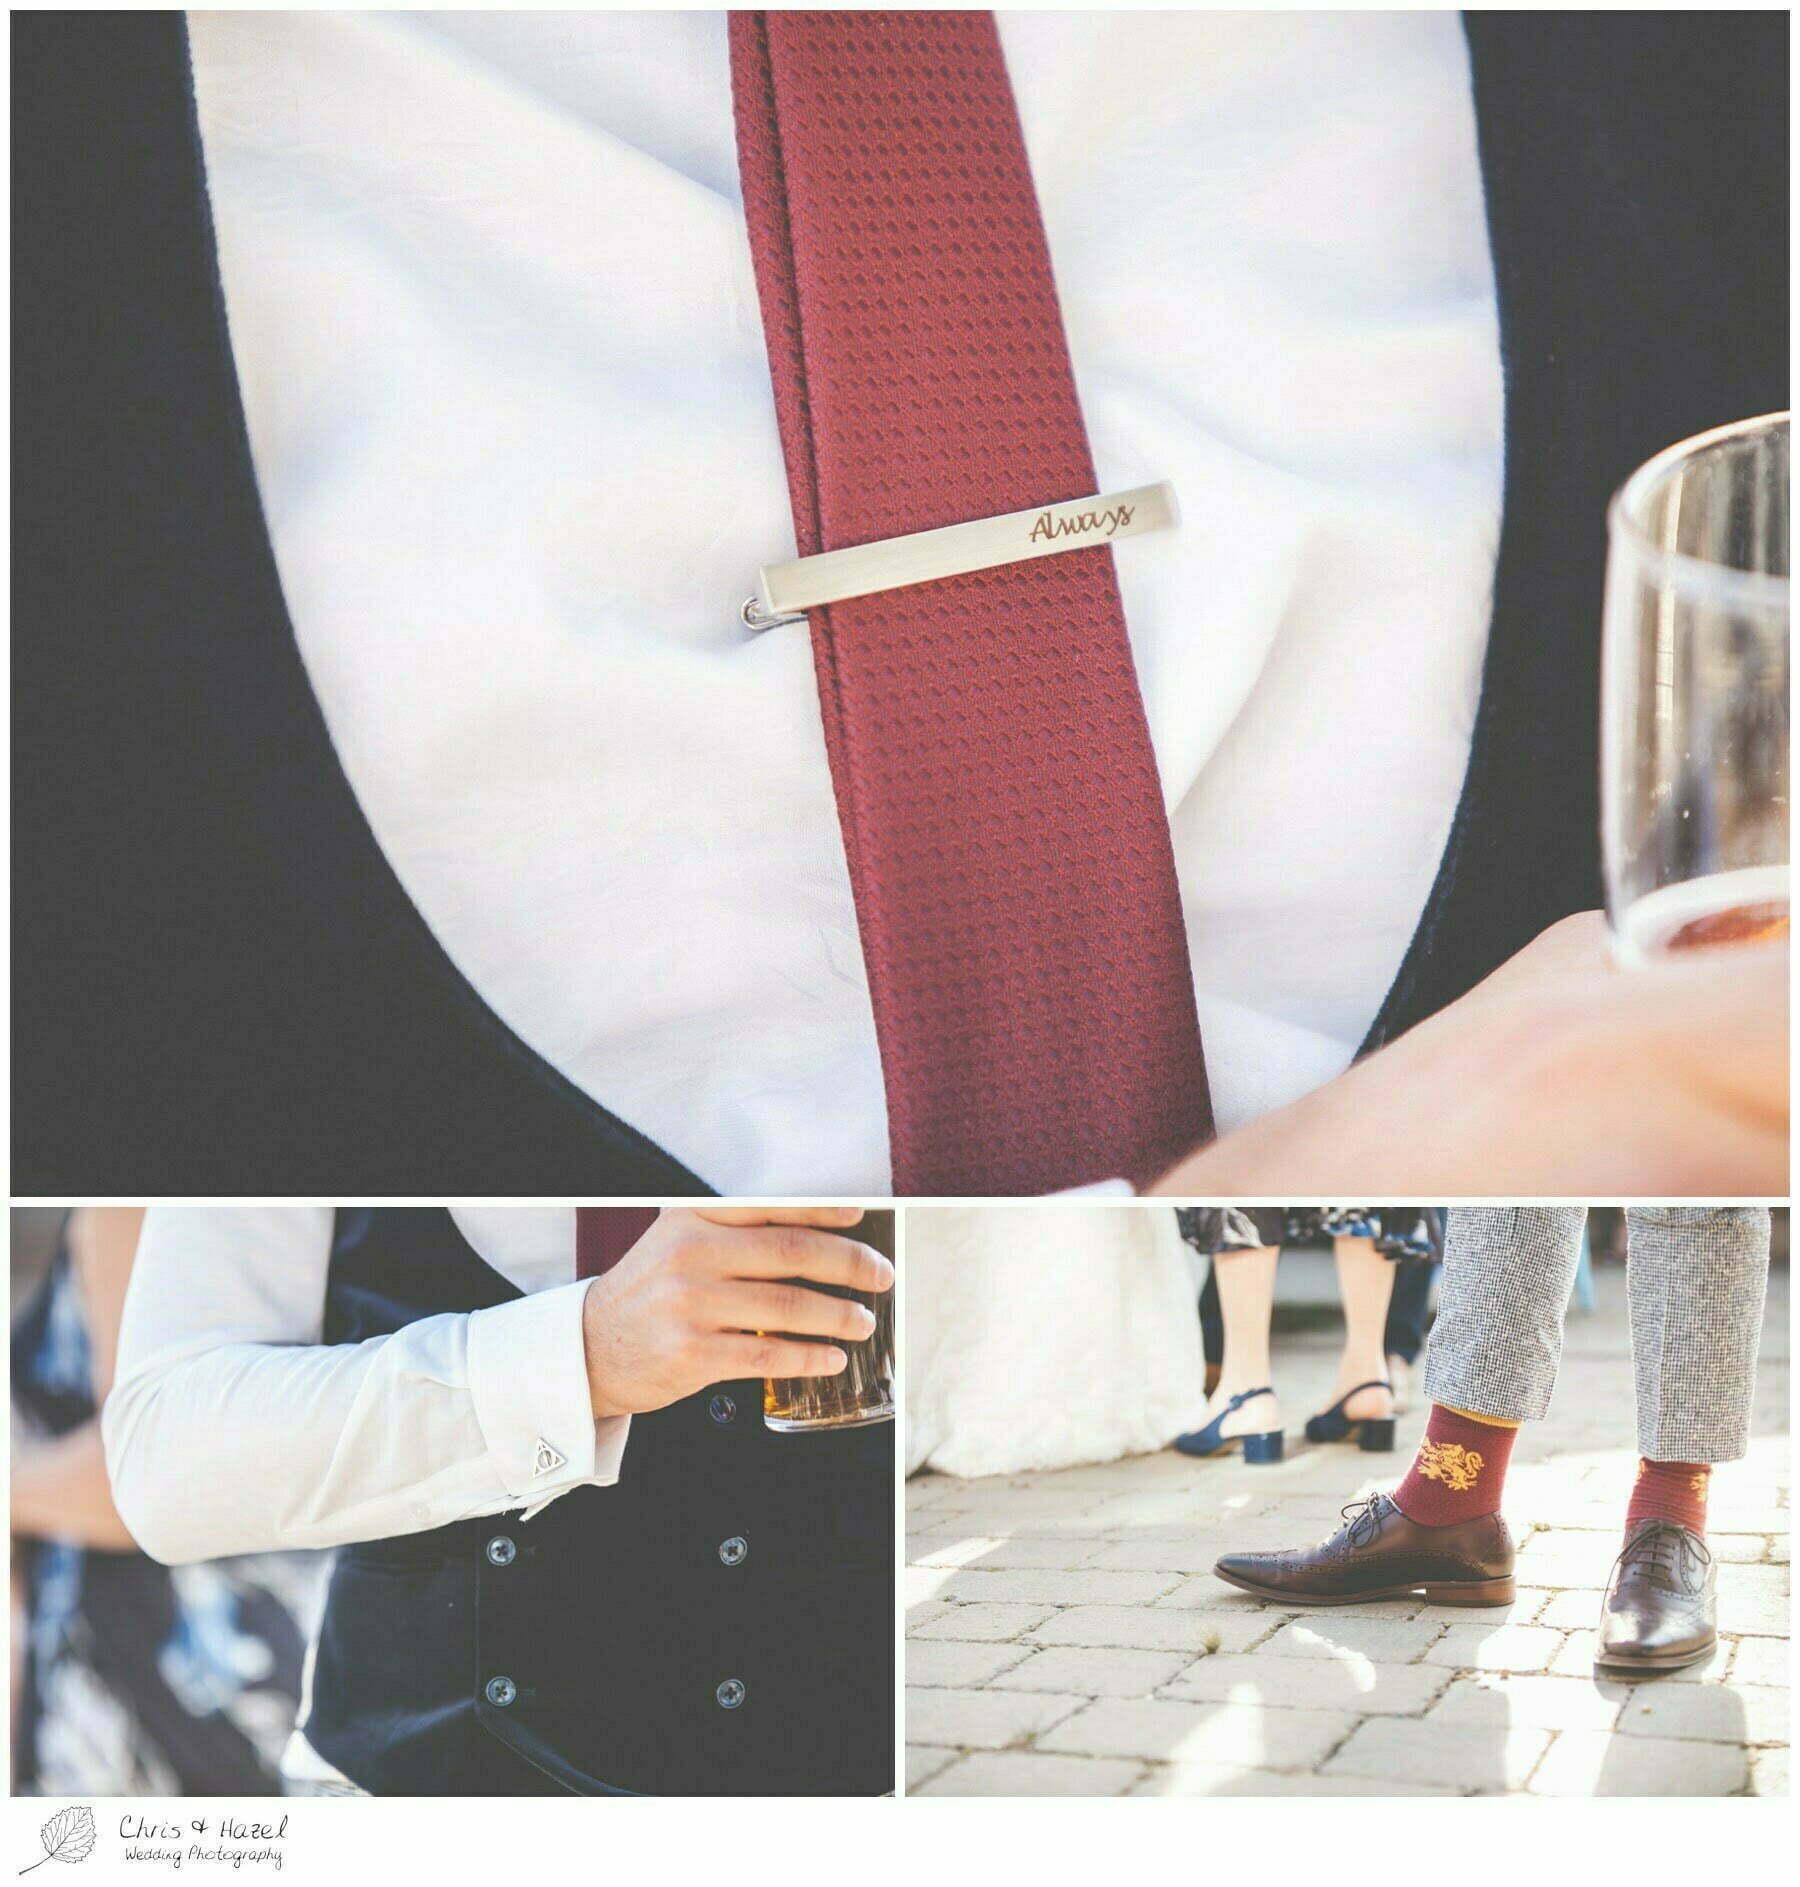 Harry potter wedding details, harry potter wedding theme, always tie pin, gryffindor socks, deathly hallows cufflinks,